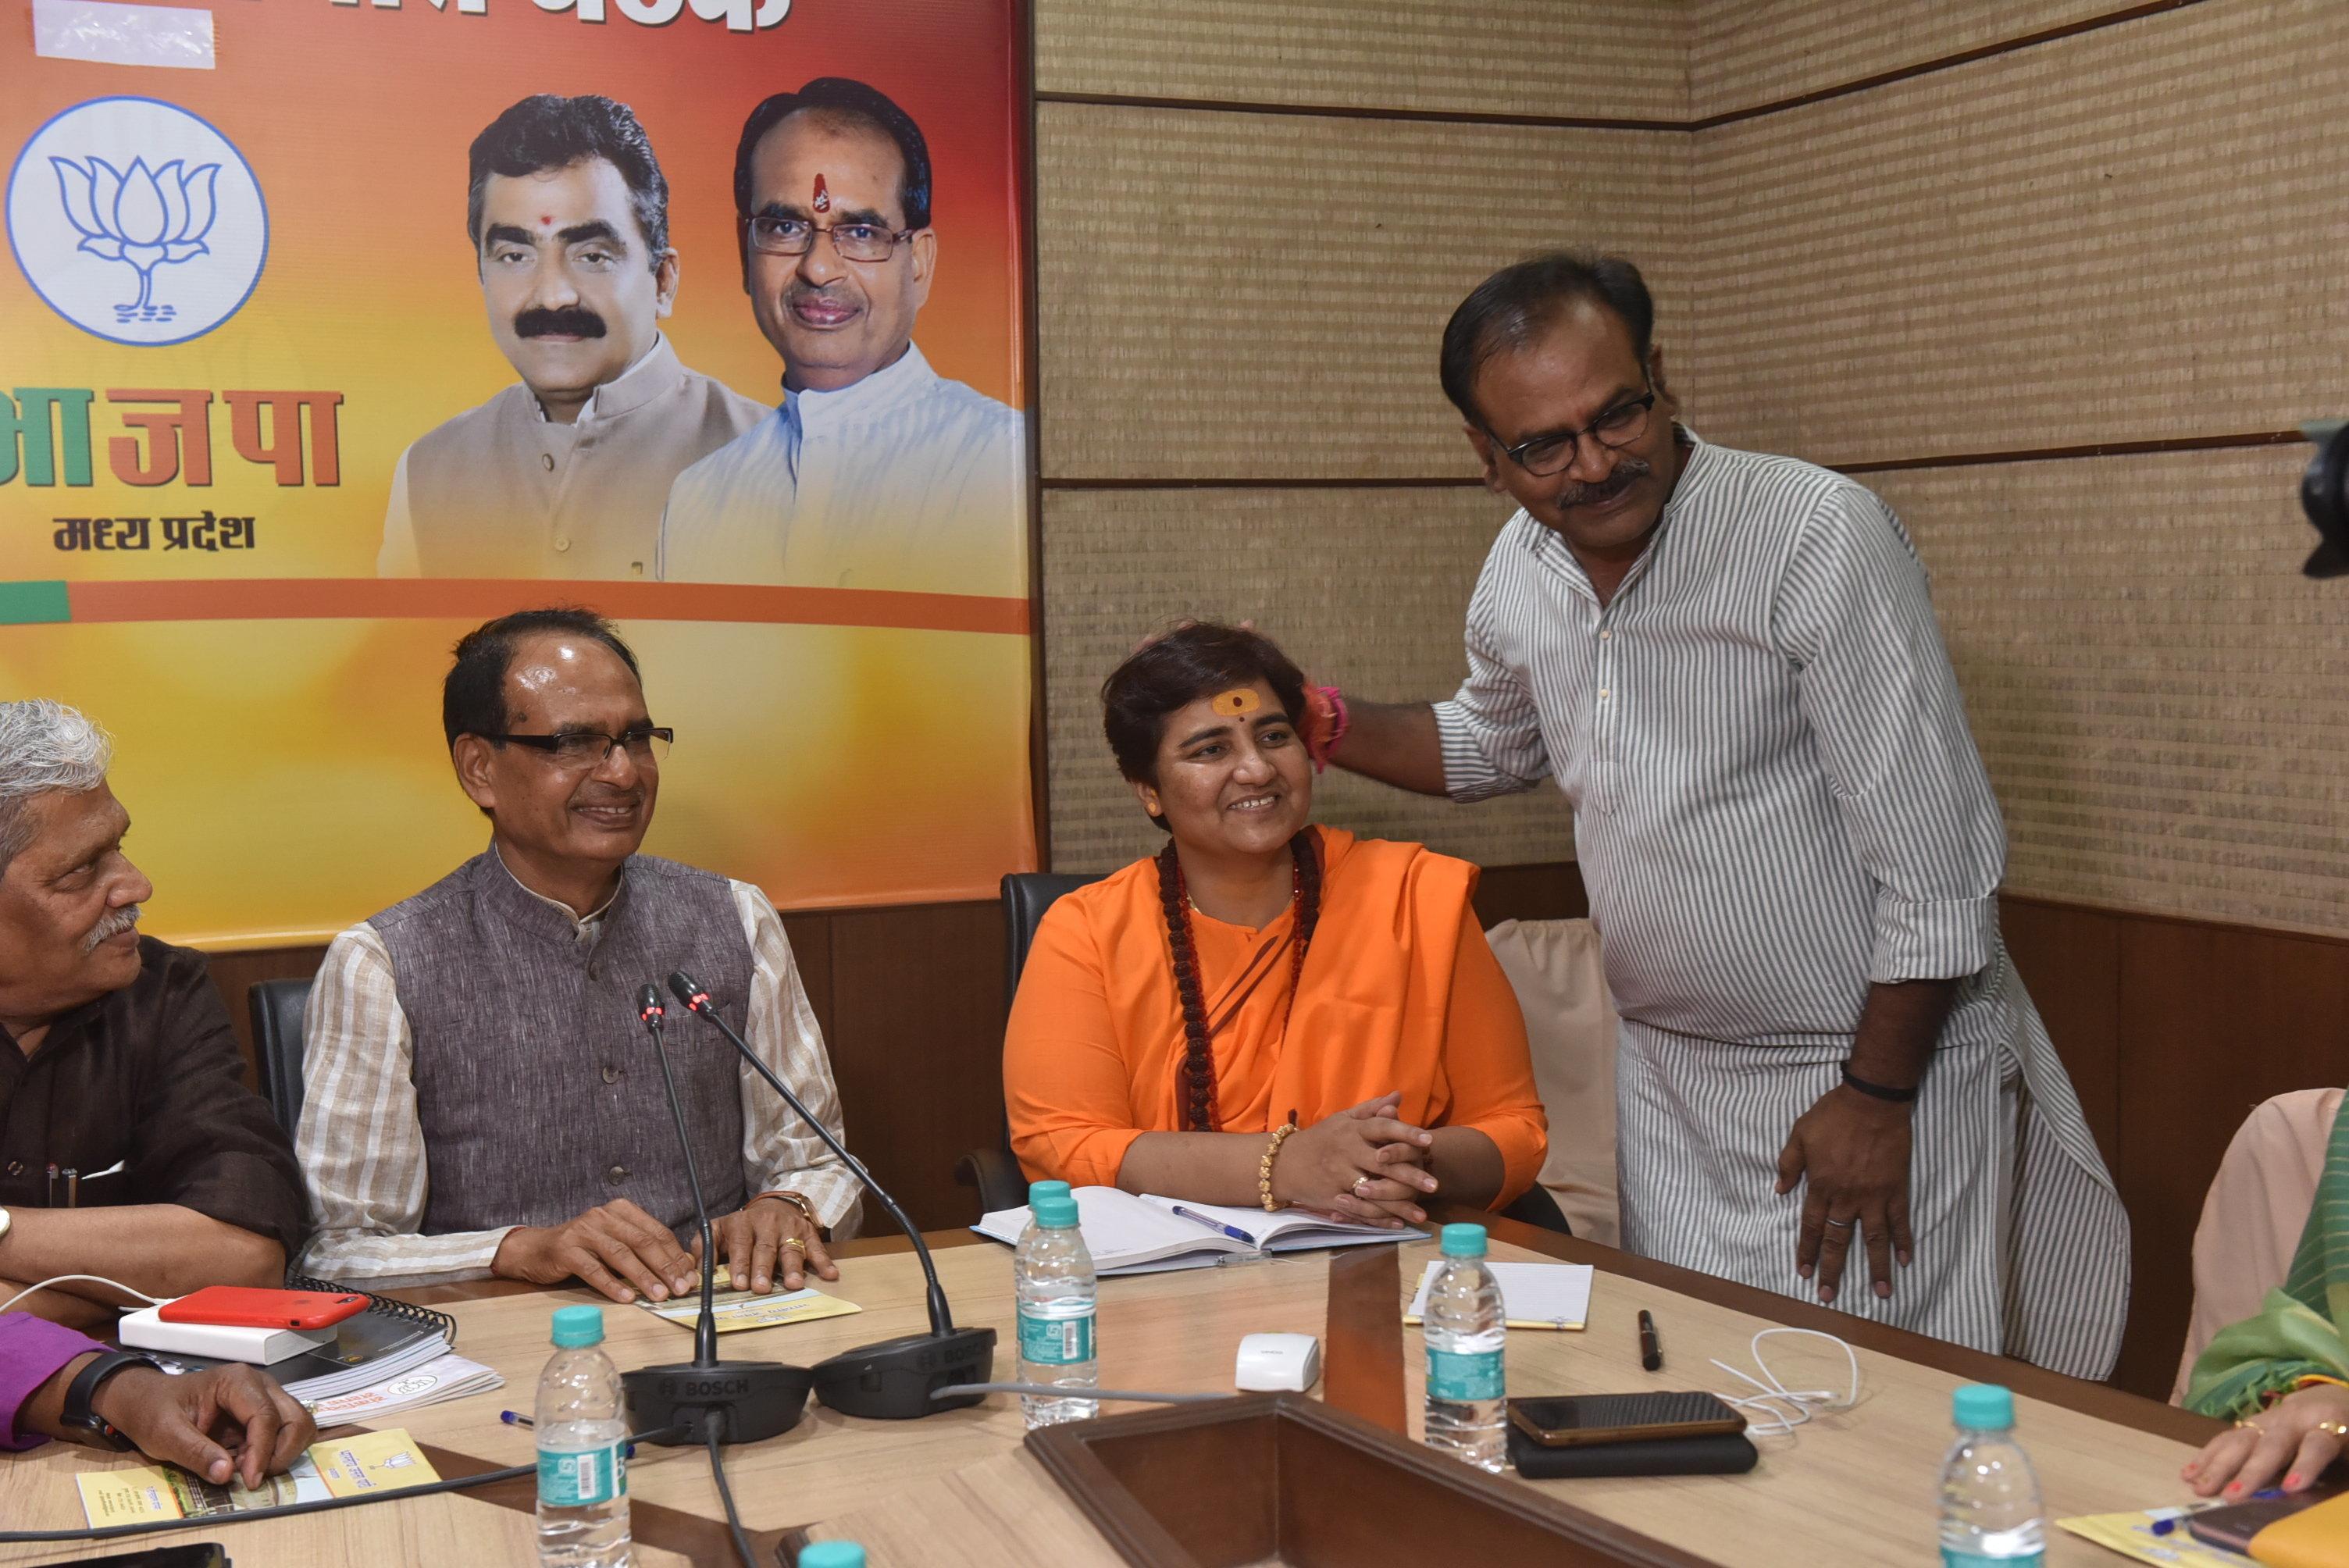 Will Pragya Thakur Beat Digvijaya Singh in BJP Bastion